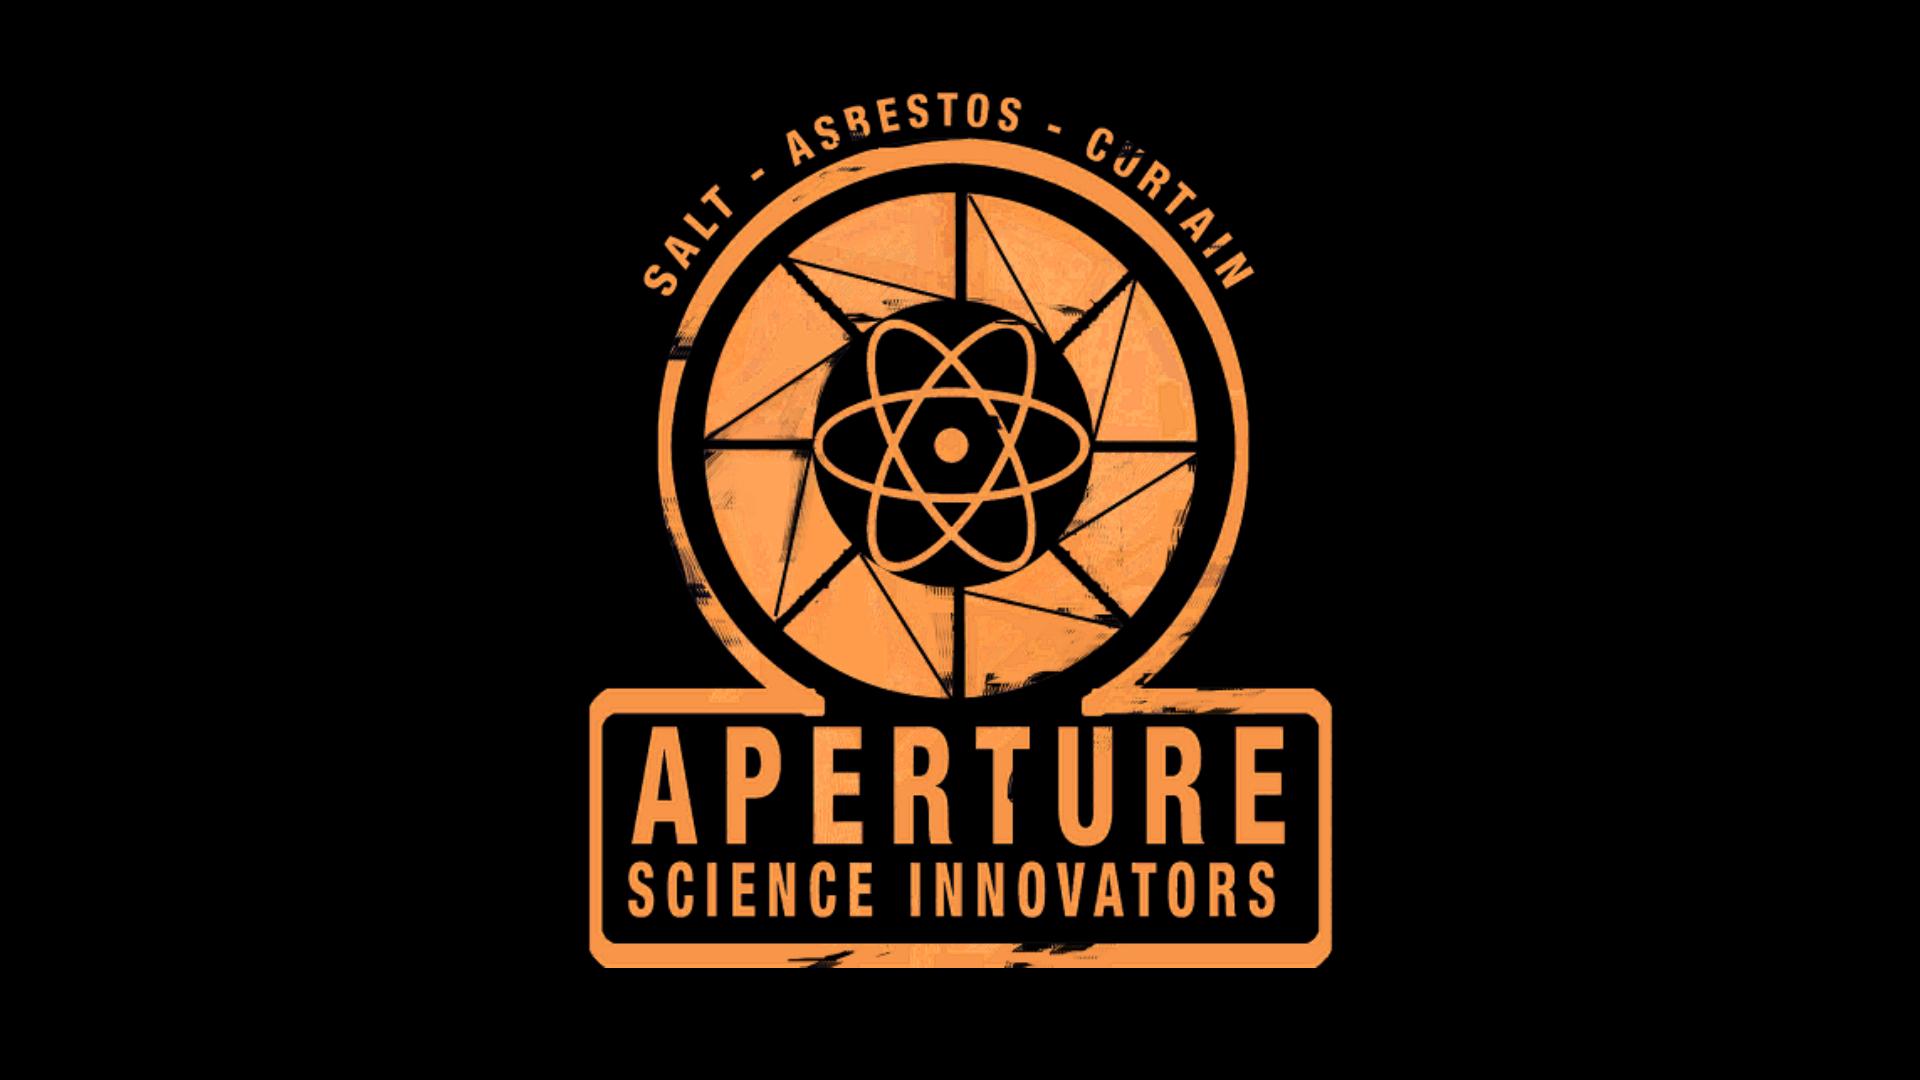 Aperture Laboratories Wallpapers 1920x1080